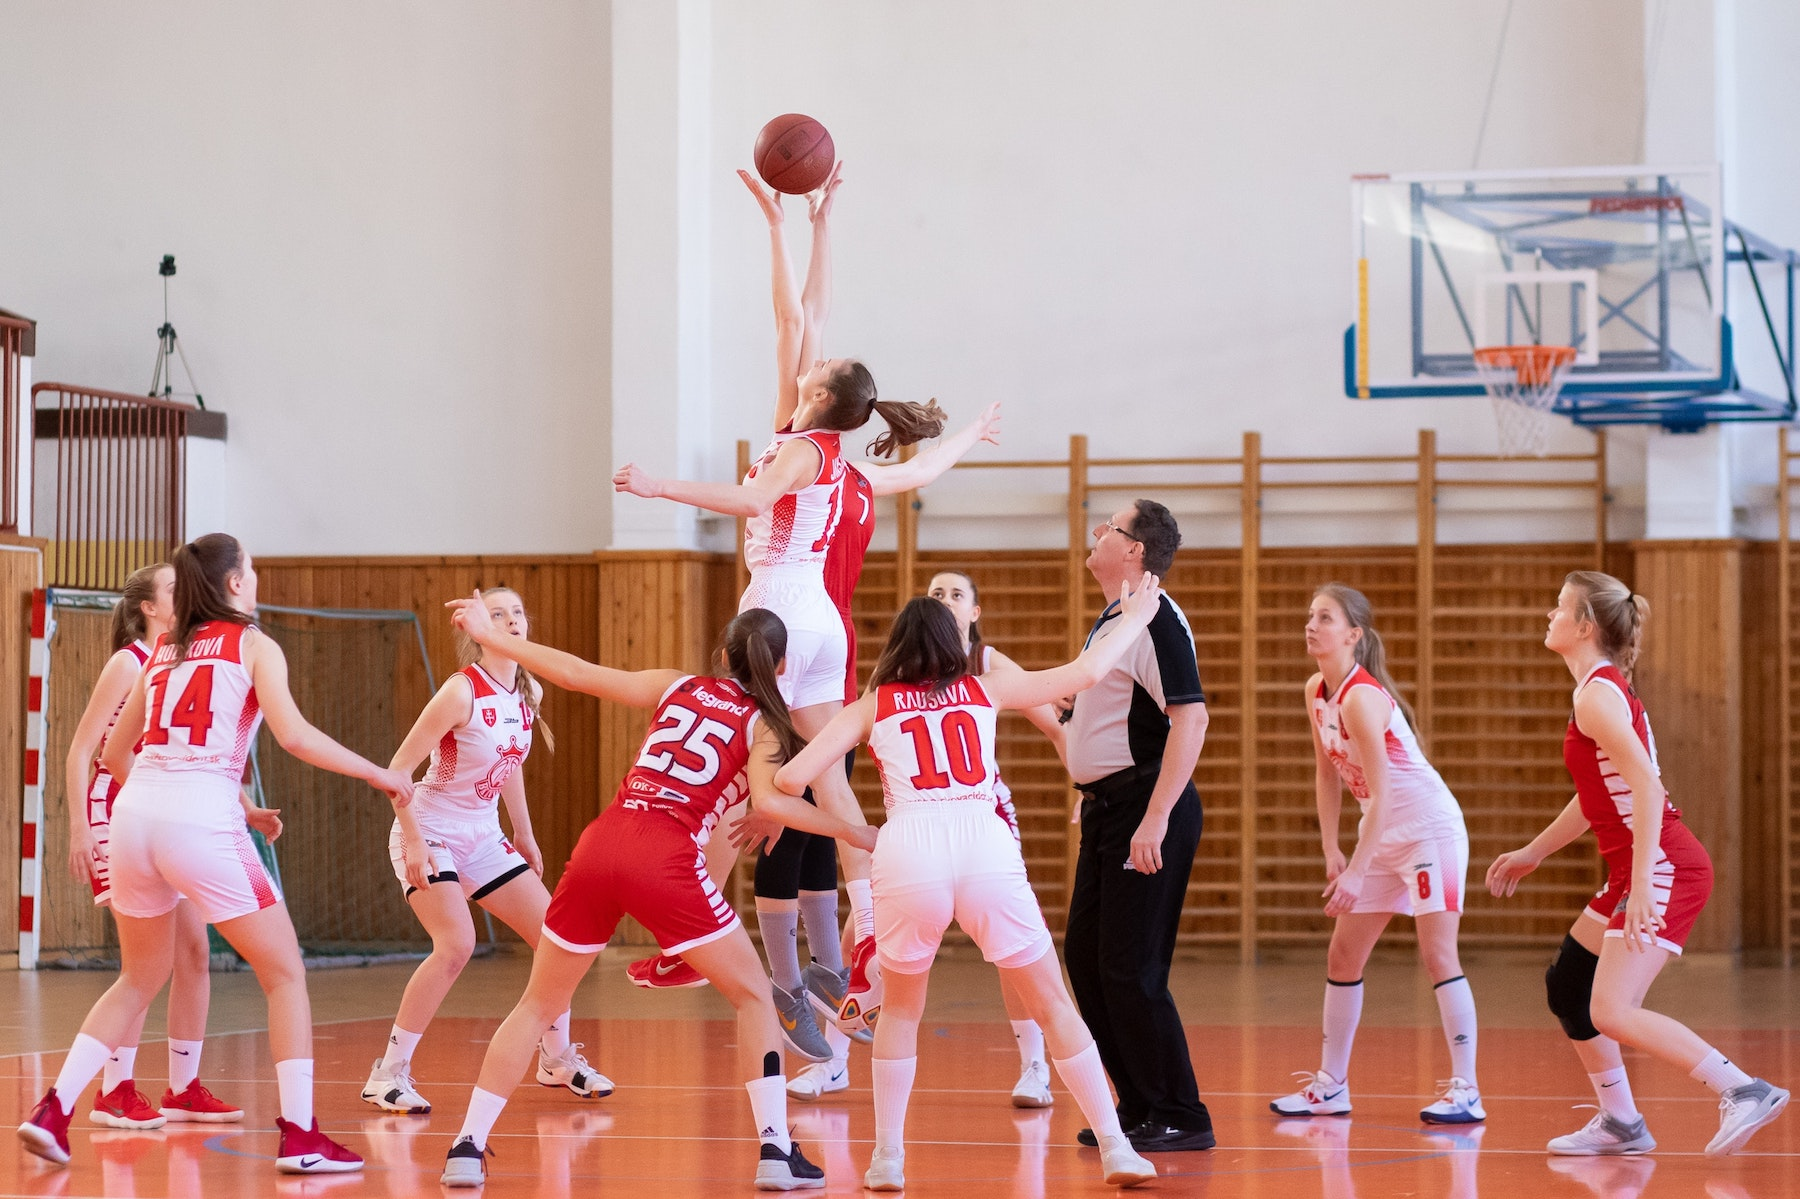 active-athletes-ball-2116469.jpg